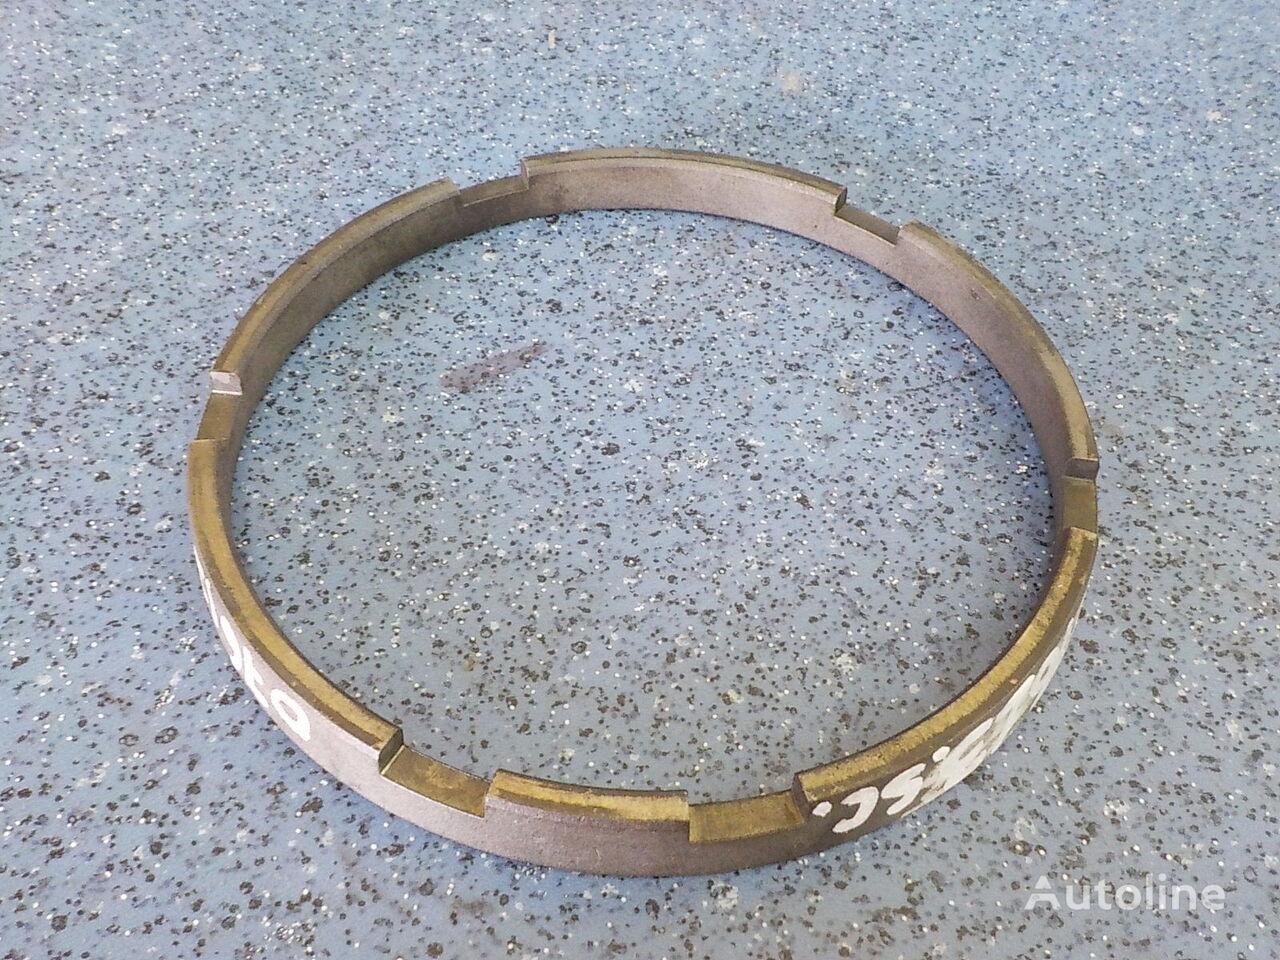 Konus sinhronizatora, satellitnoe koleso pièces de rechange pour SCANIA camion